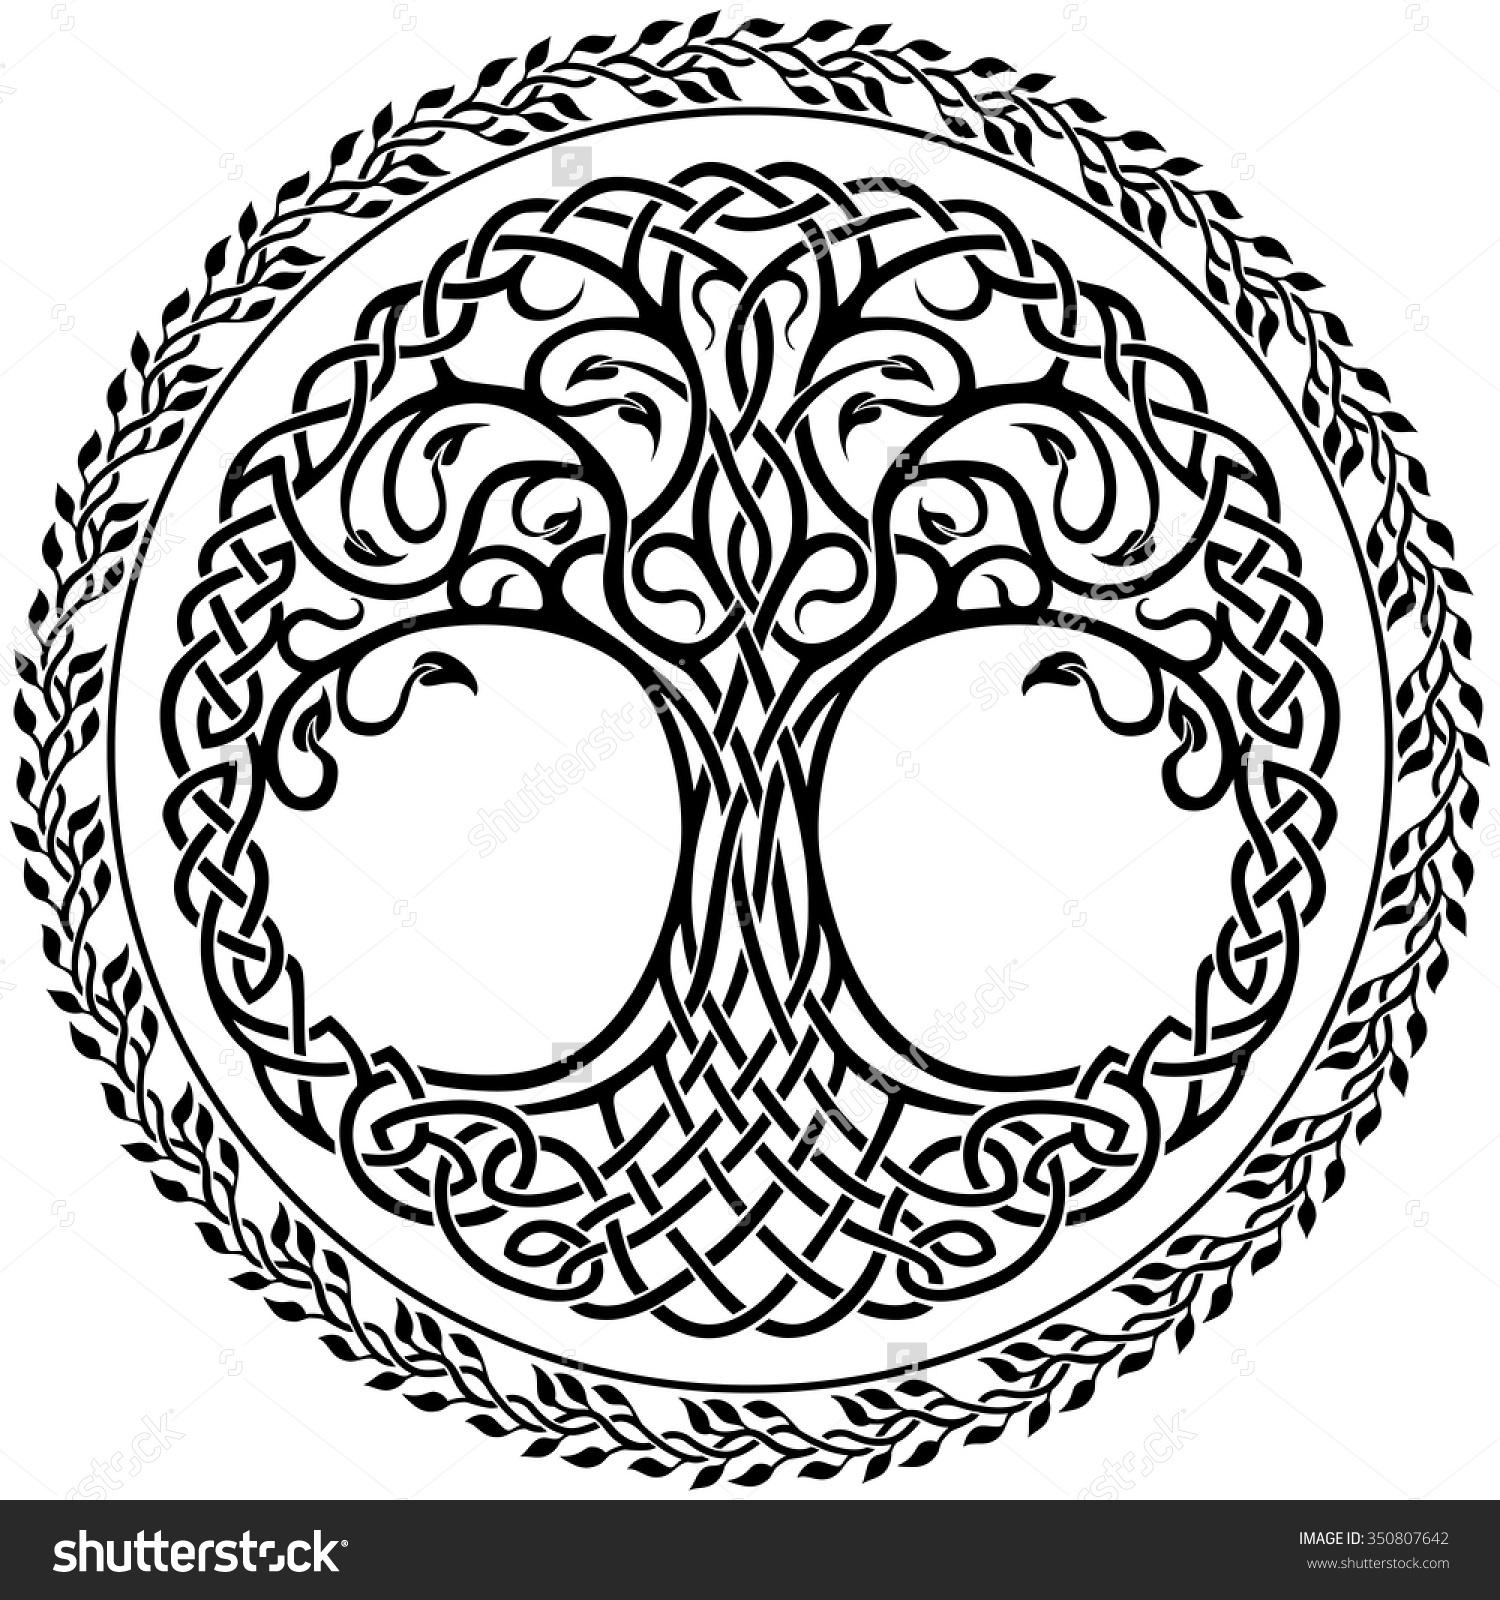 1500x1600 Celtic Tree Of Life Drawing Vector Ornament, Decorative Celtic